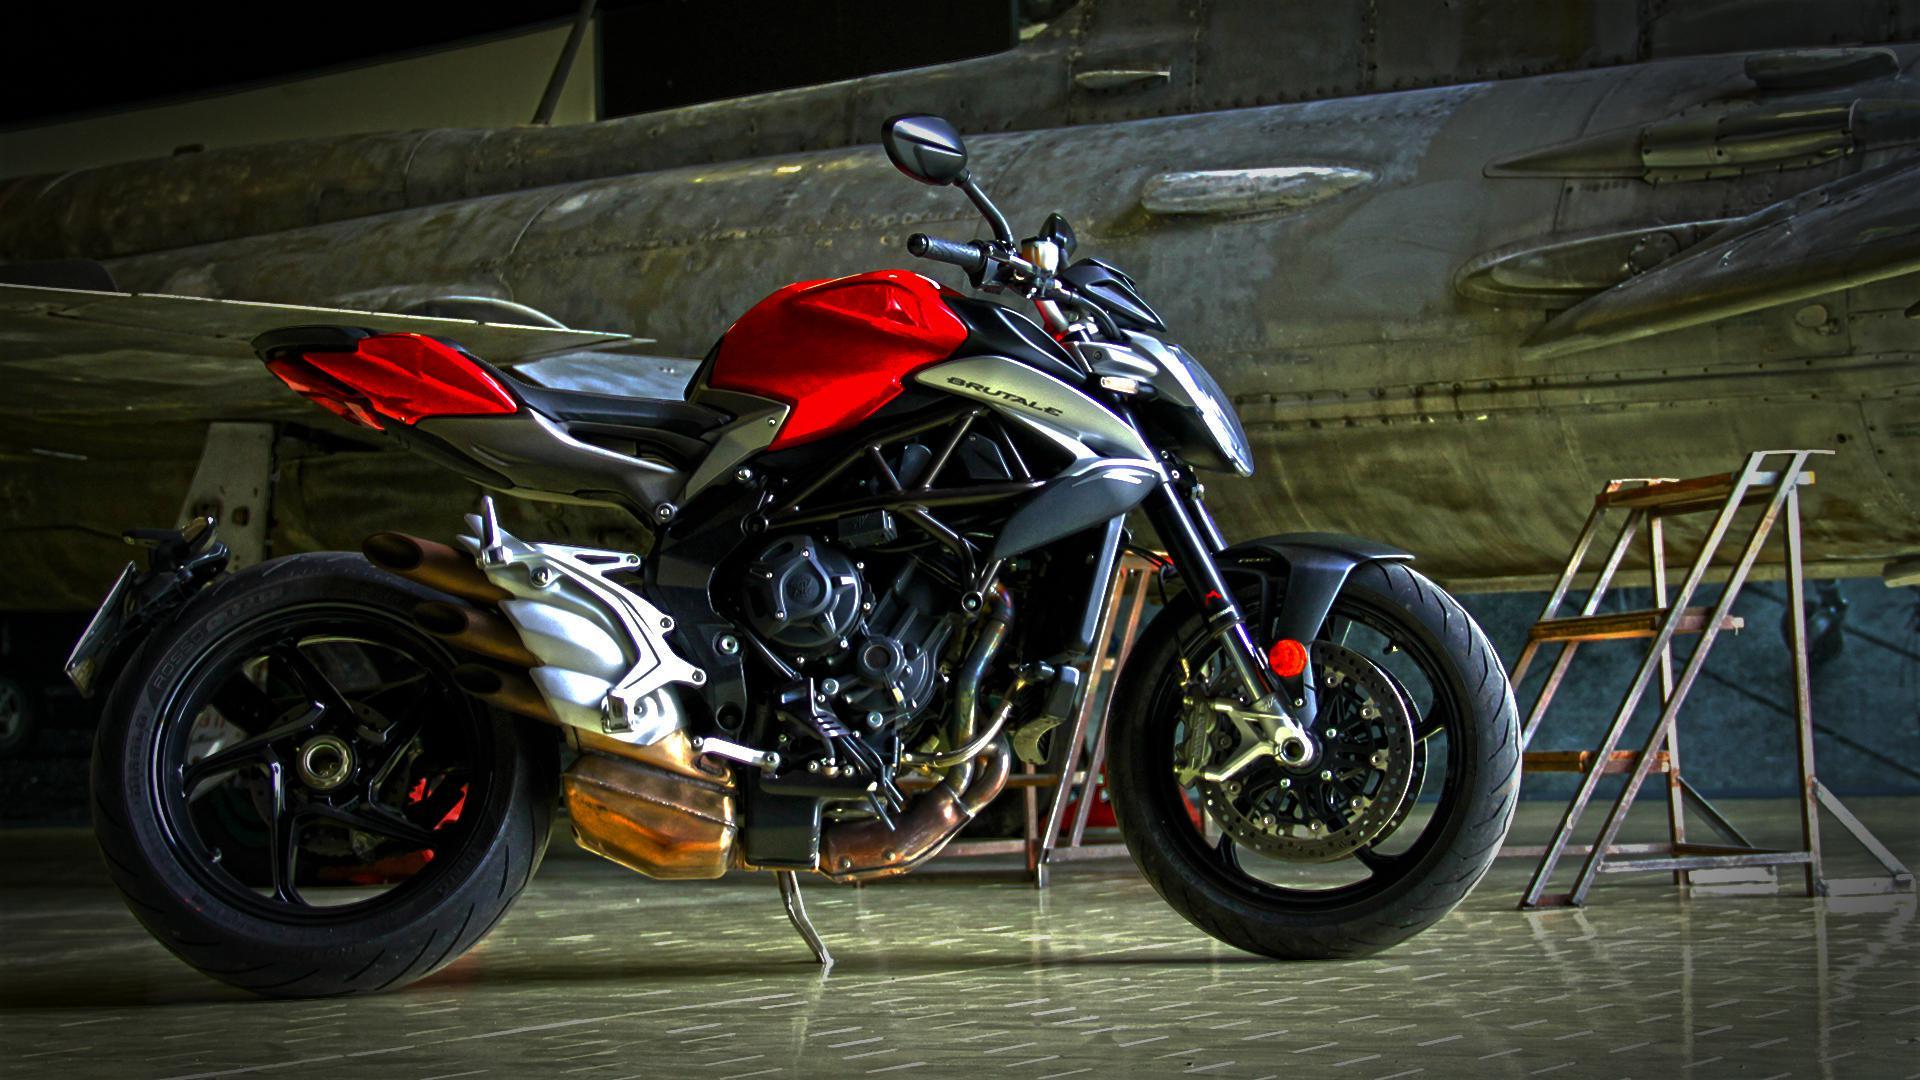 mv-agusta-brutale-800-prova-test-75